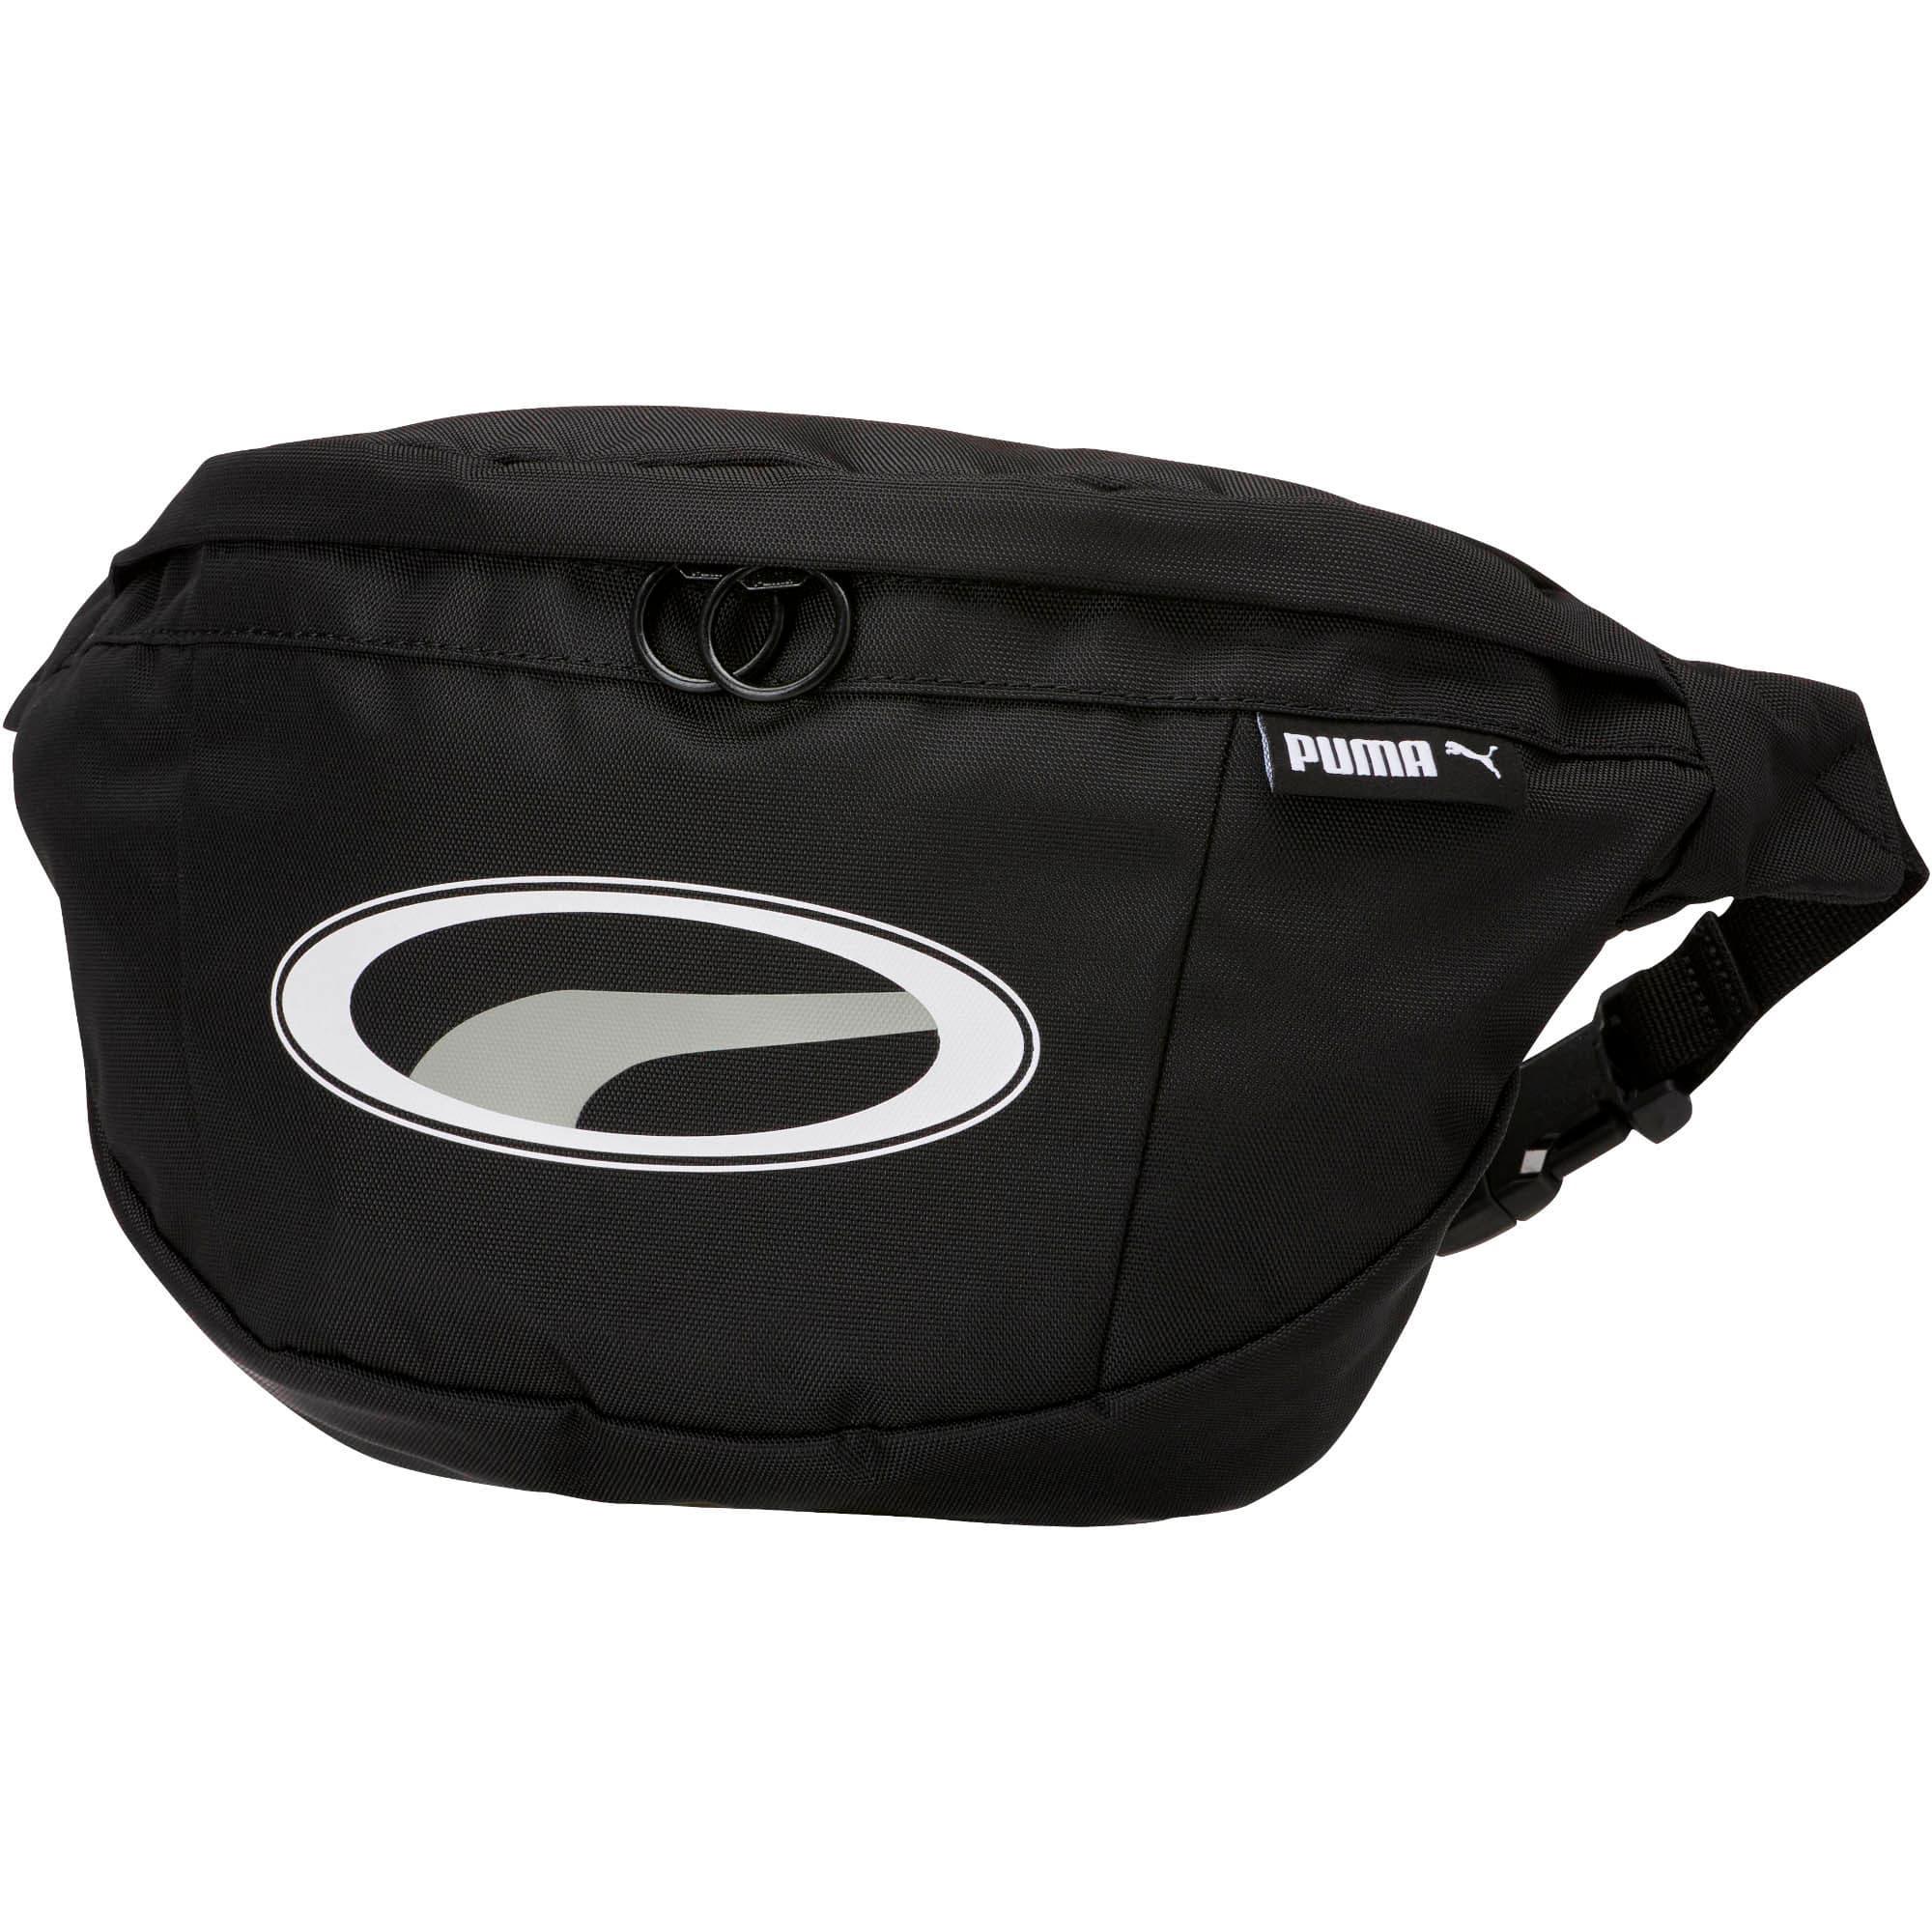 Thumbnail 1 of Originals Cell Waist Bag, Puma Black-Cell OG SL9, medium